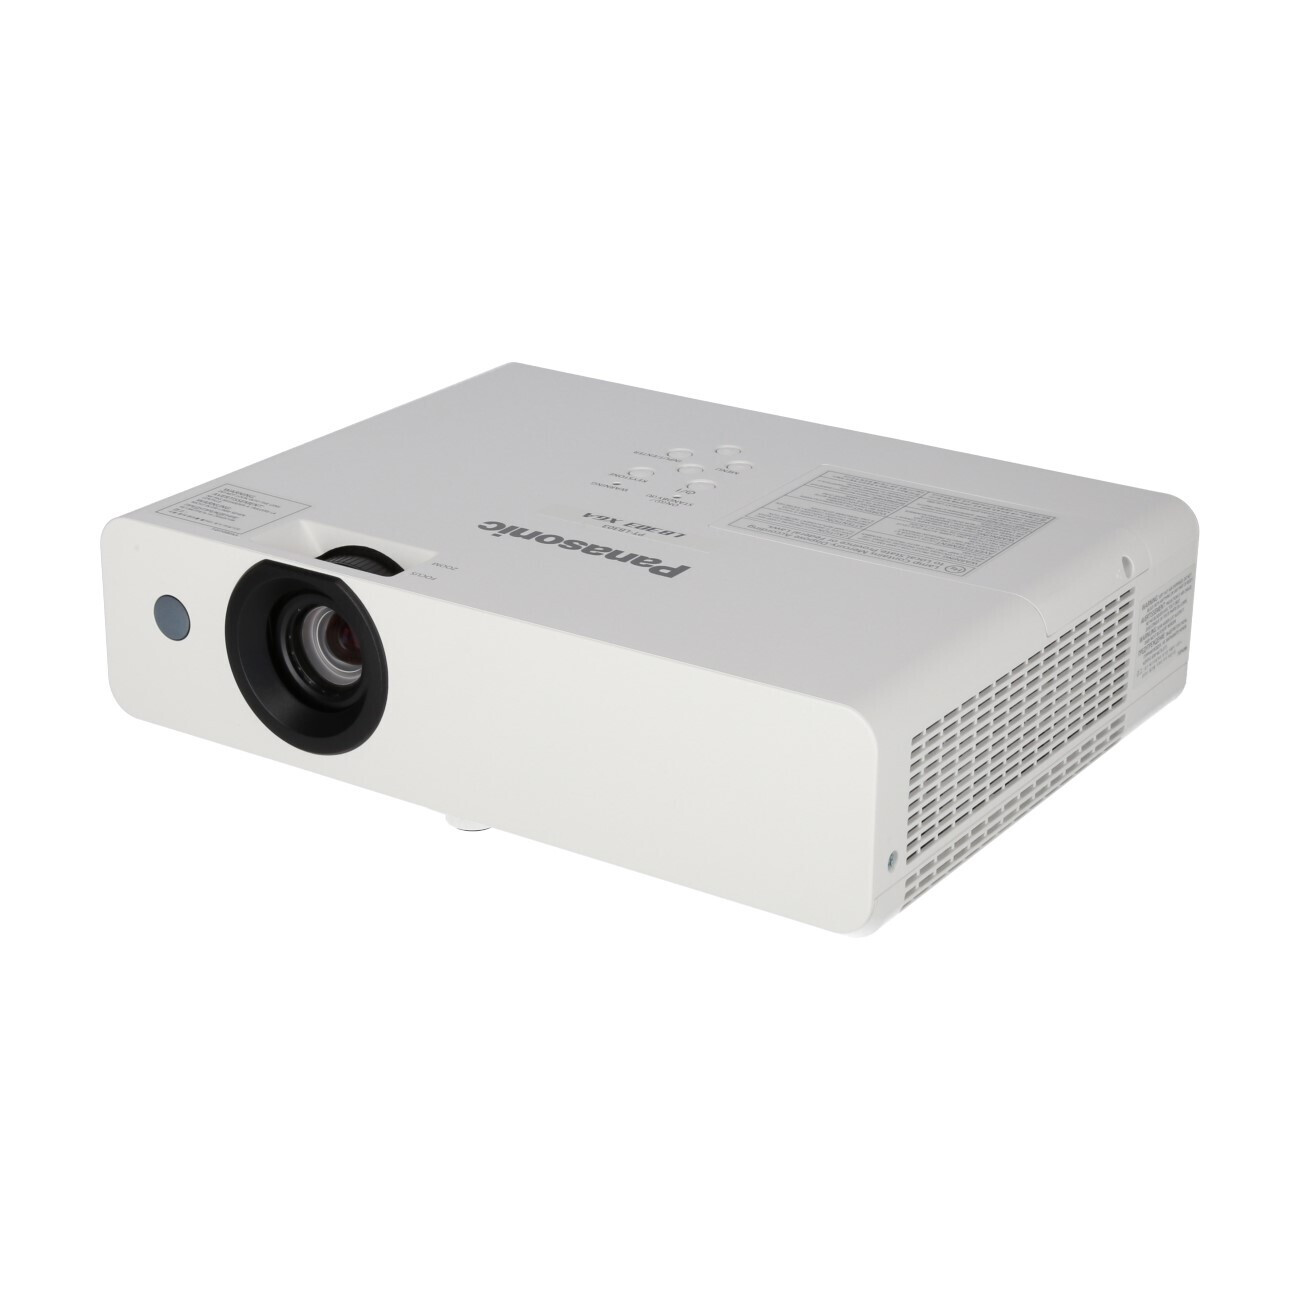 Panasonic PT-LB303 Beamer mit 3100 ANSI-Lumen und XGA Auflösung